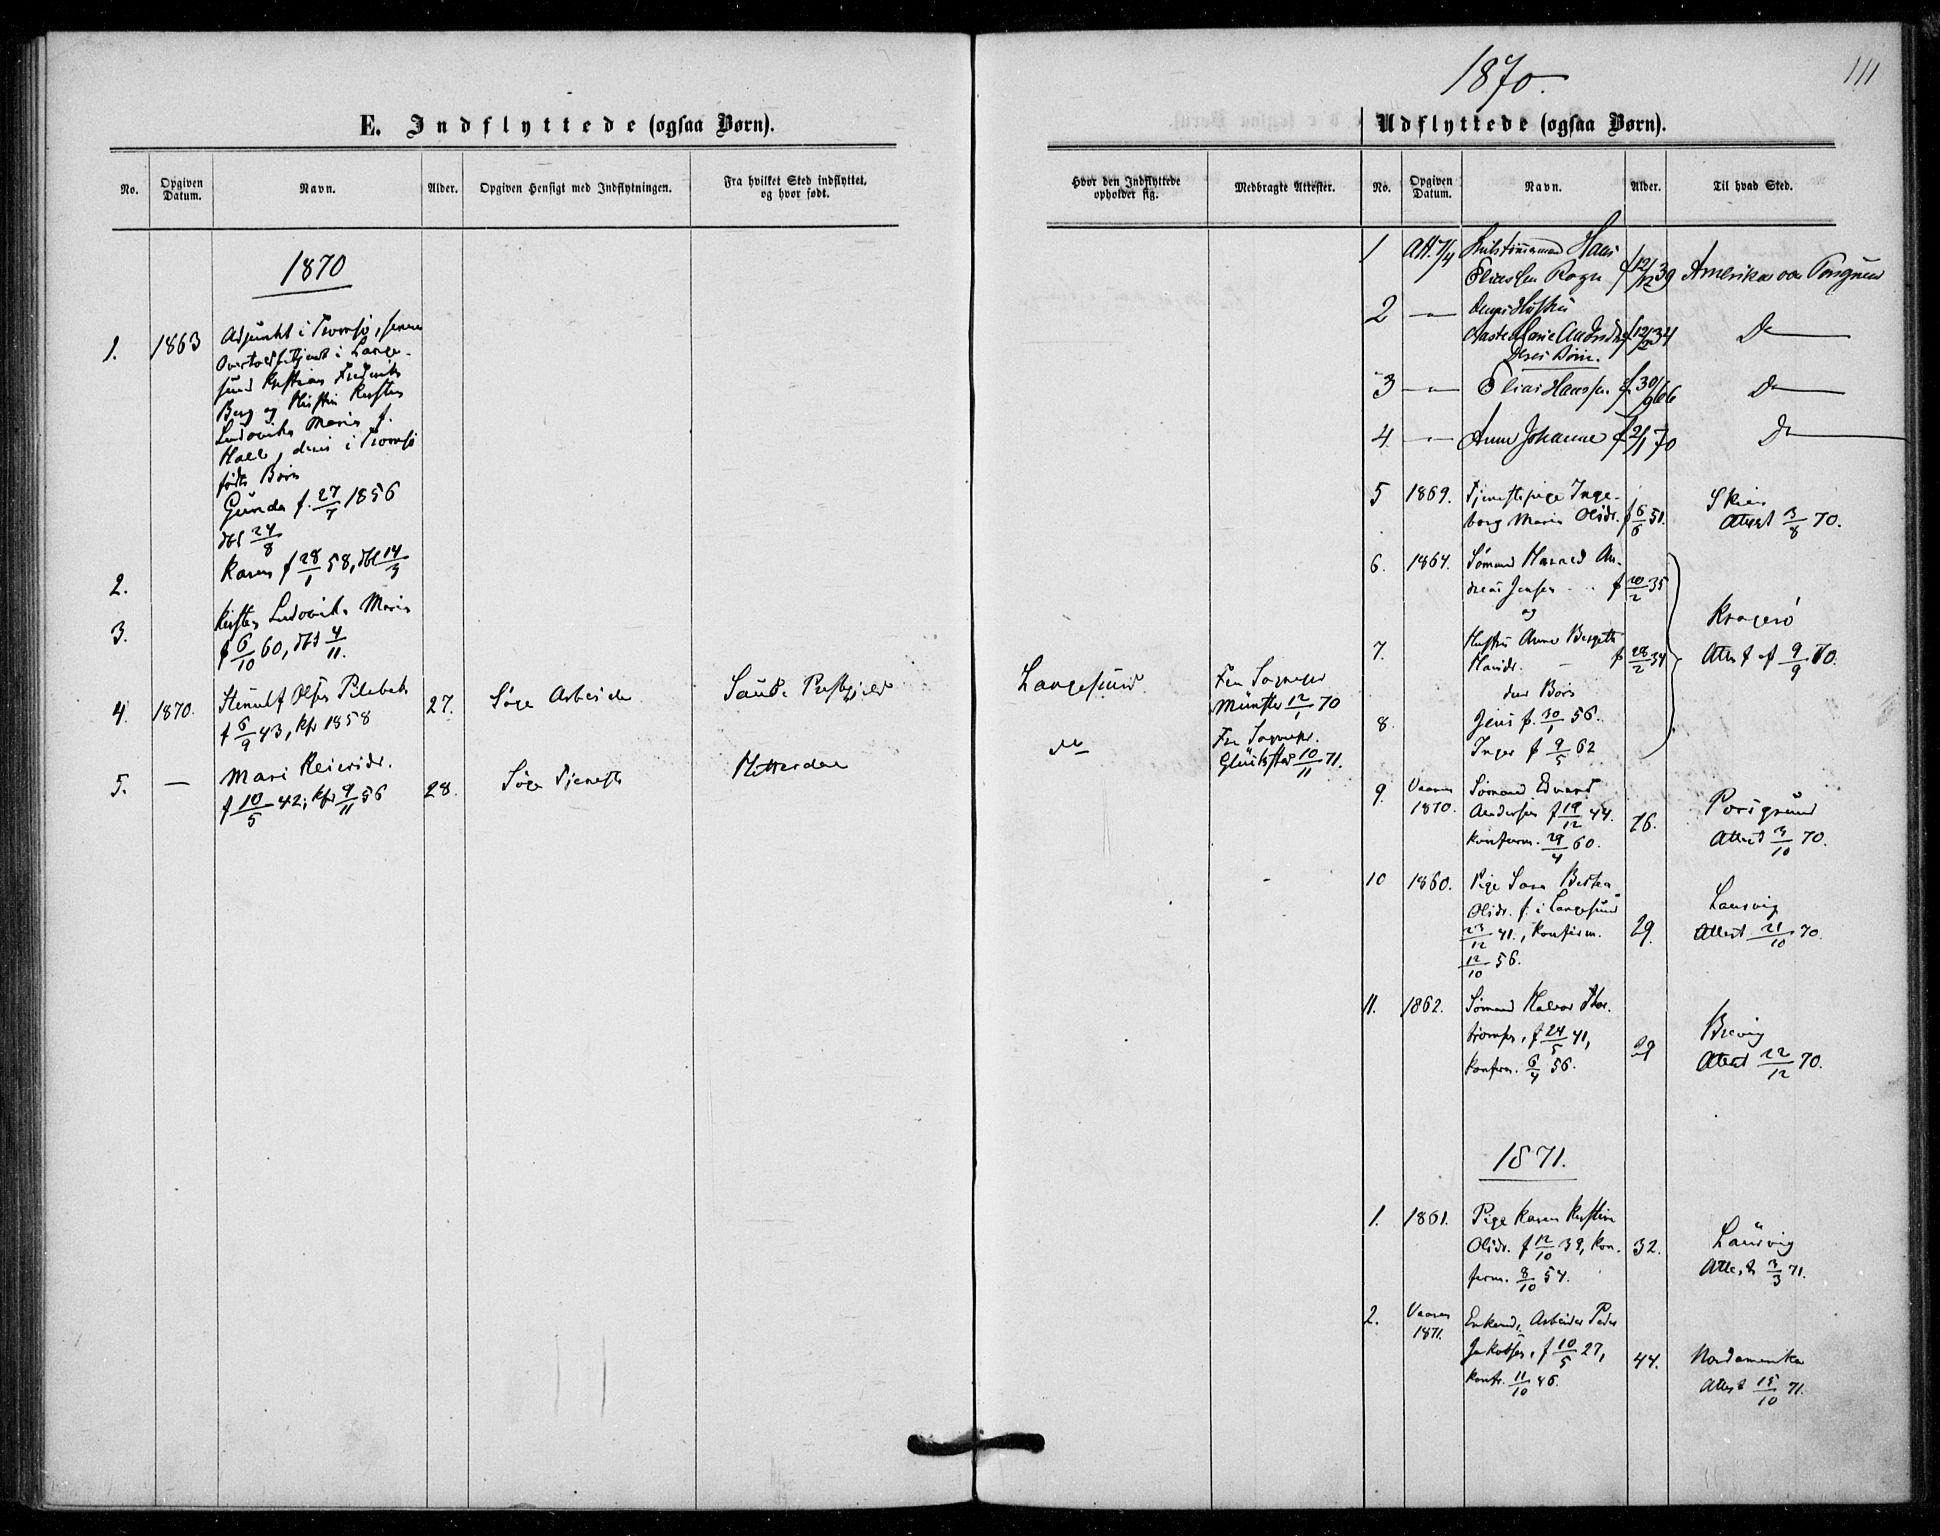 SAKO, Langesund kirkebøker, F/Fa/L0001: Ministerialbok nr. 1, 1870-1877, s. 111